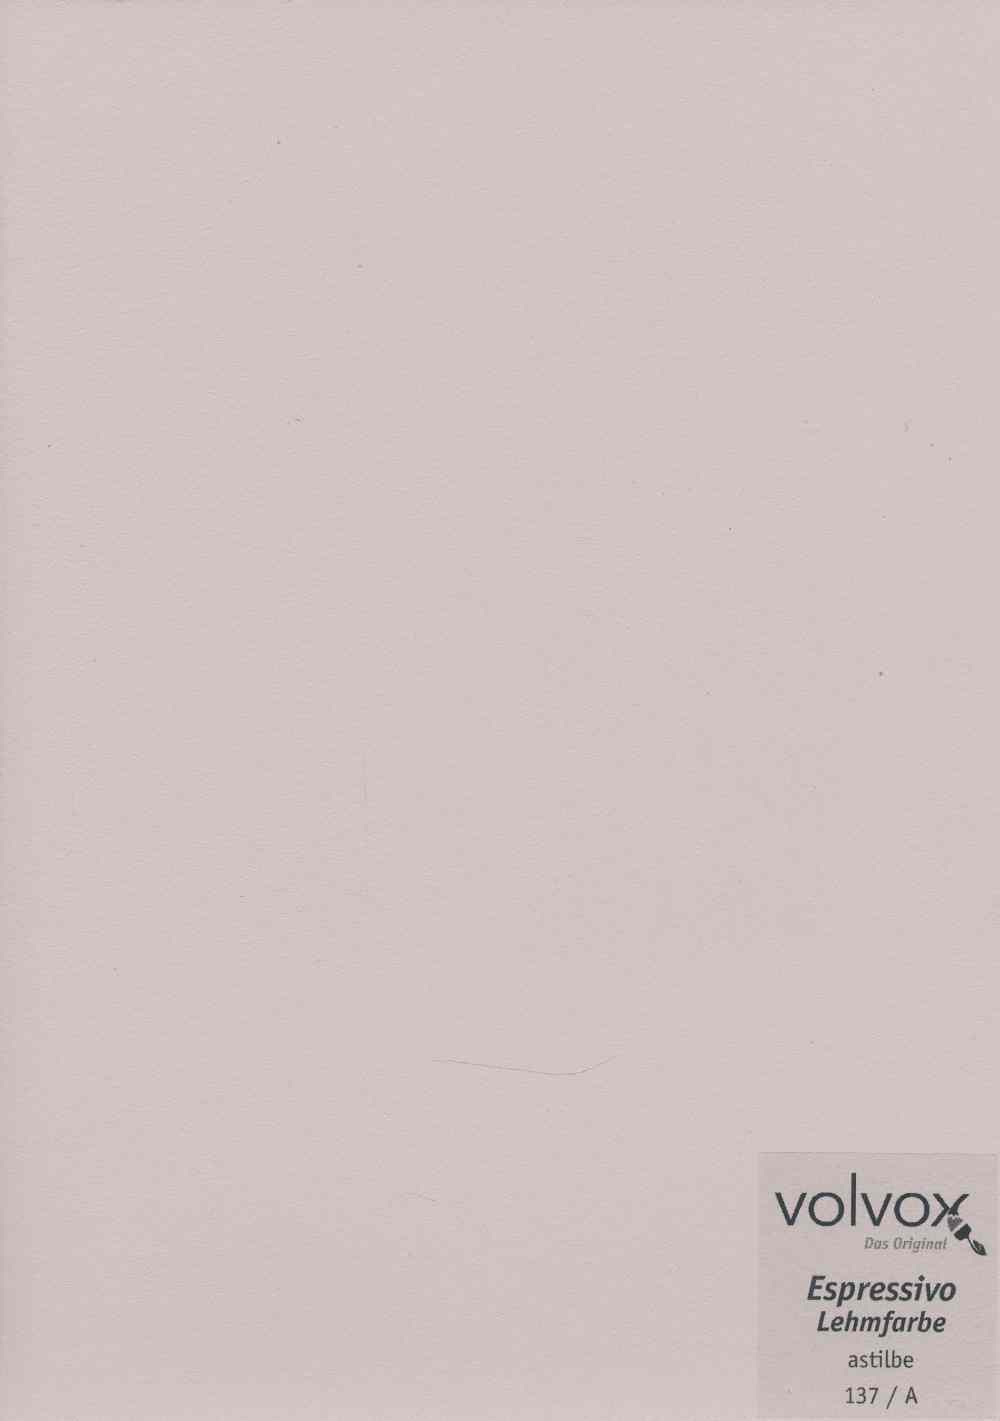 Volvox Espressivo Lehmfarbe 137 astilbe